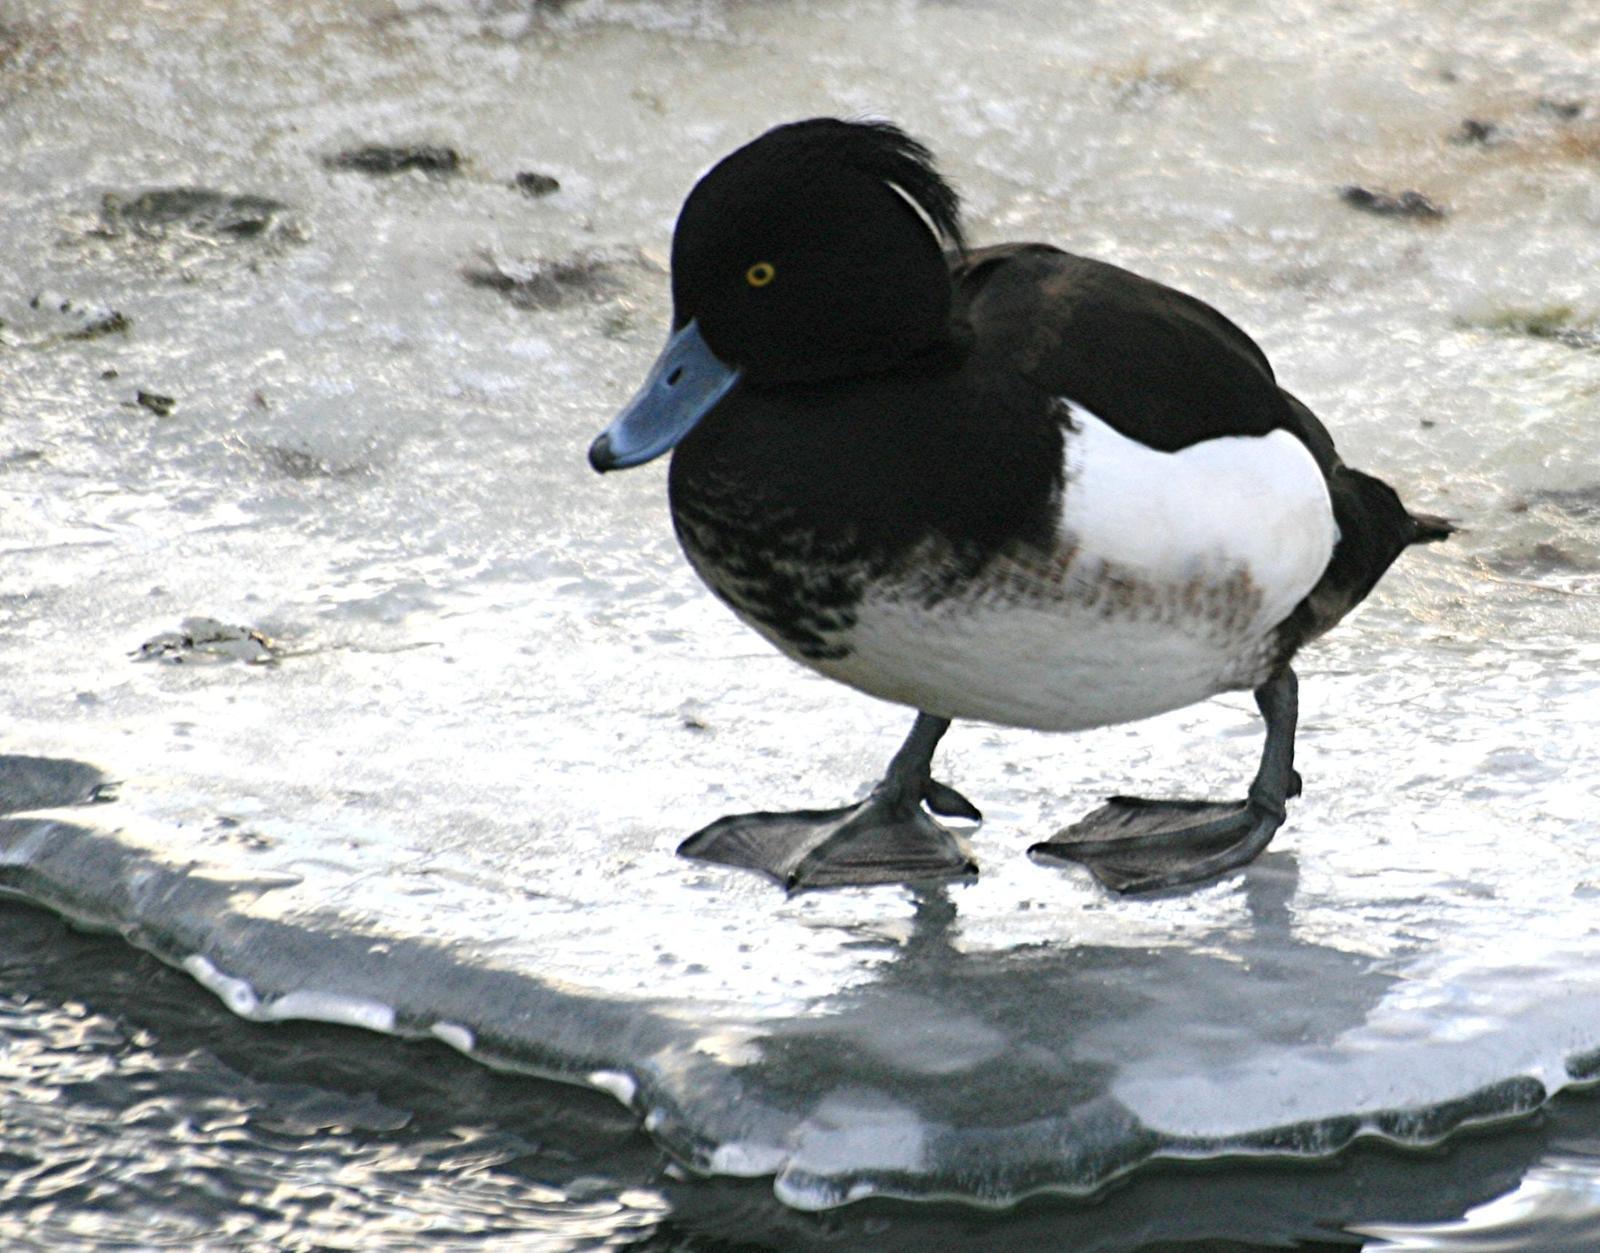 Tufted Duck Photo by Aaron Hywarren